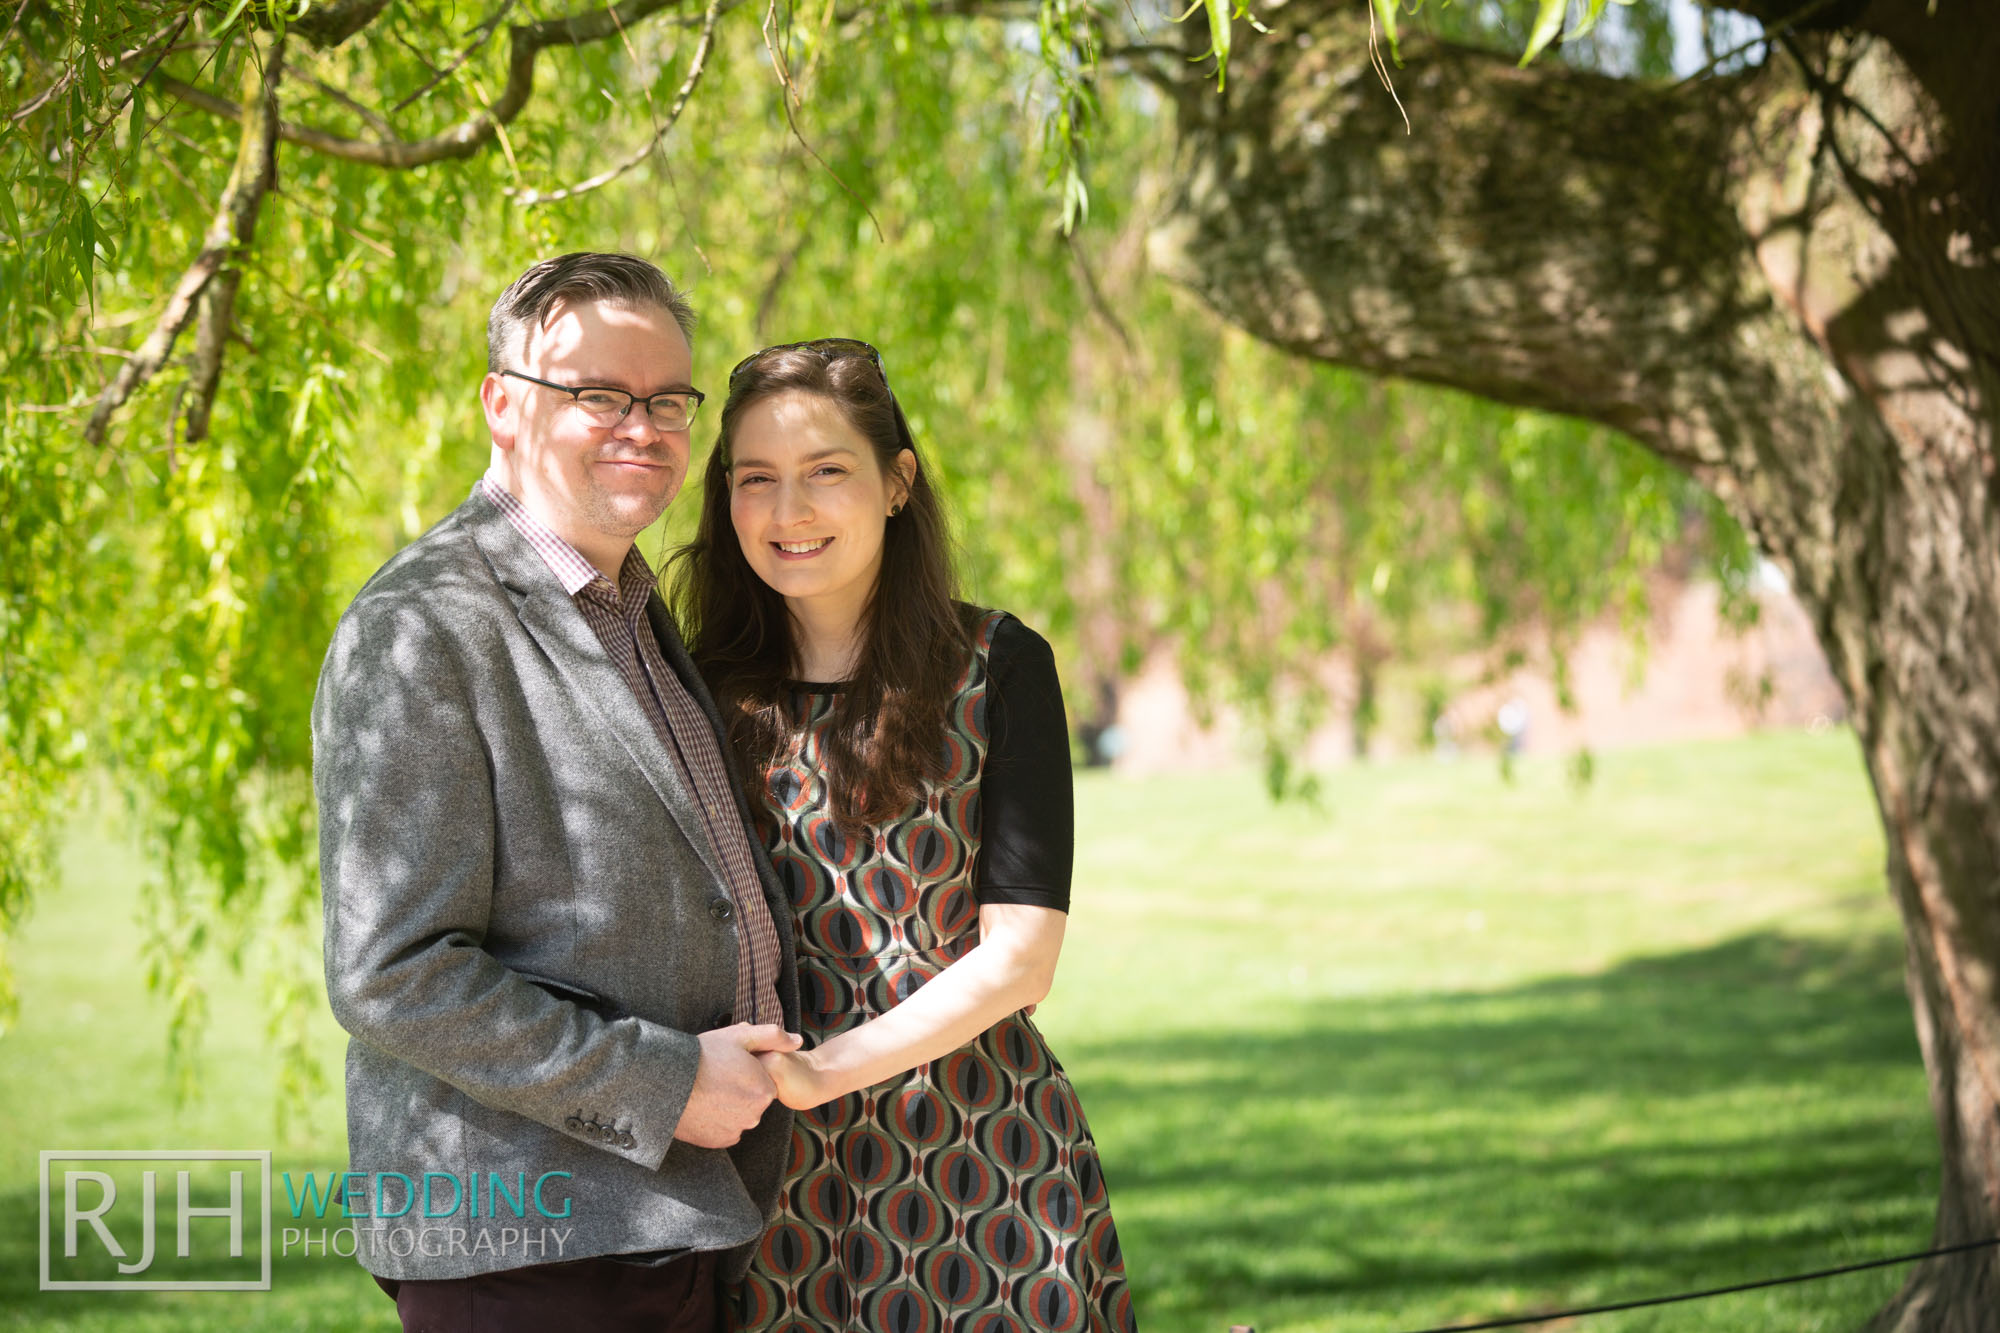 Pre-wedding photography - Richard & Rachel_001_3C2A8104.jpg